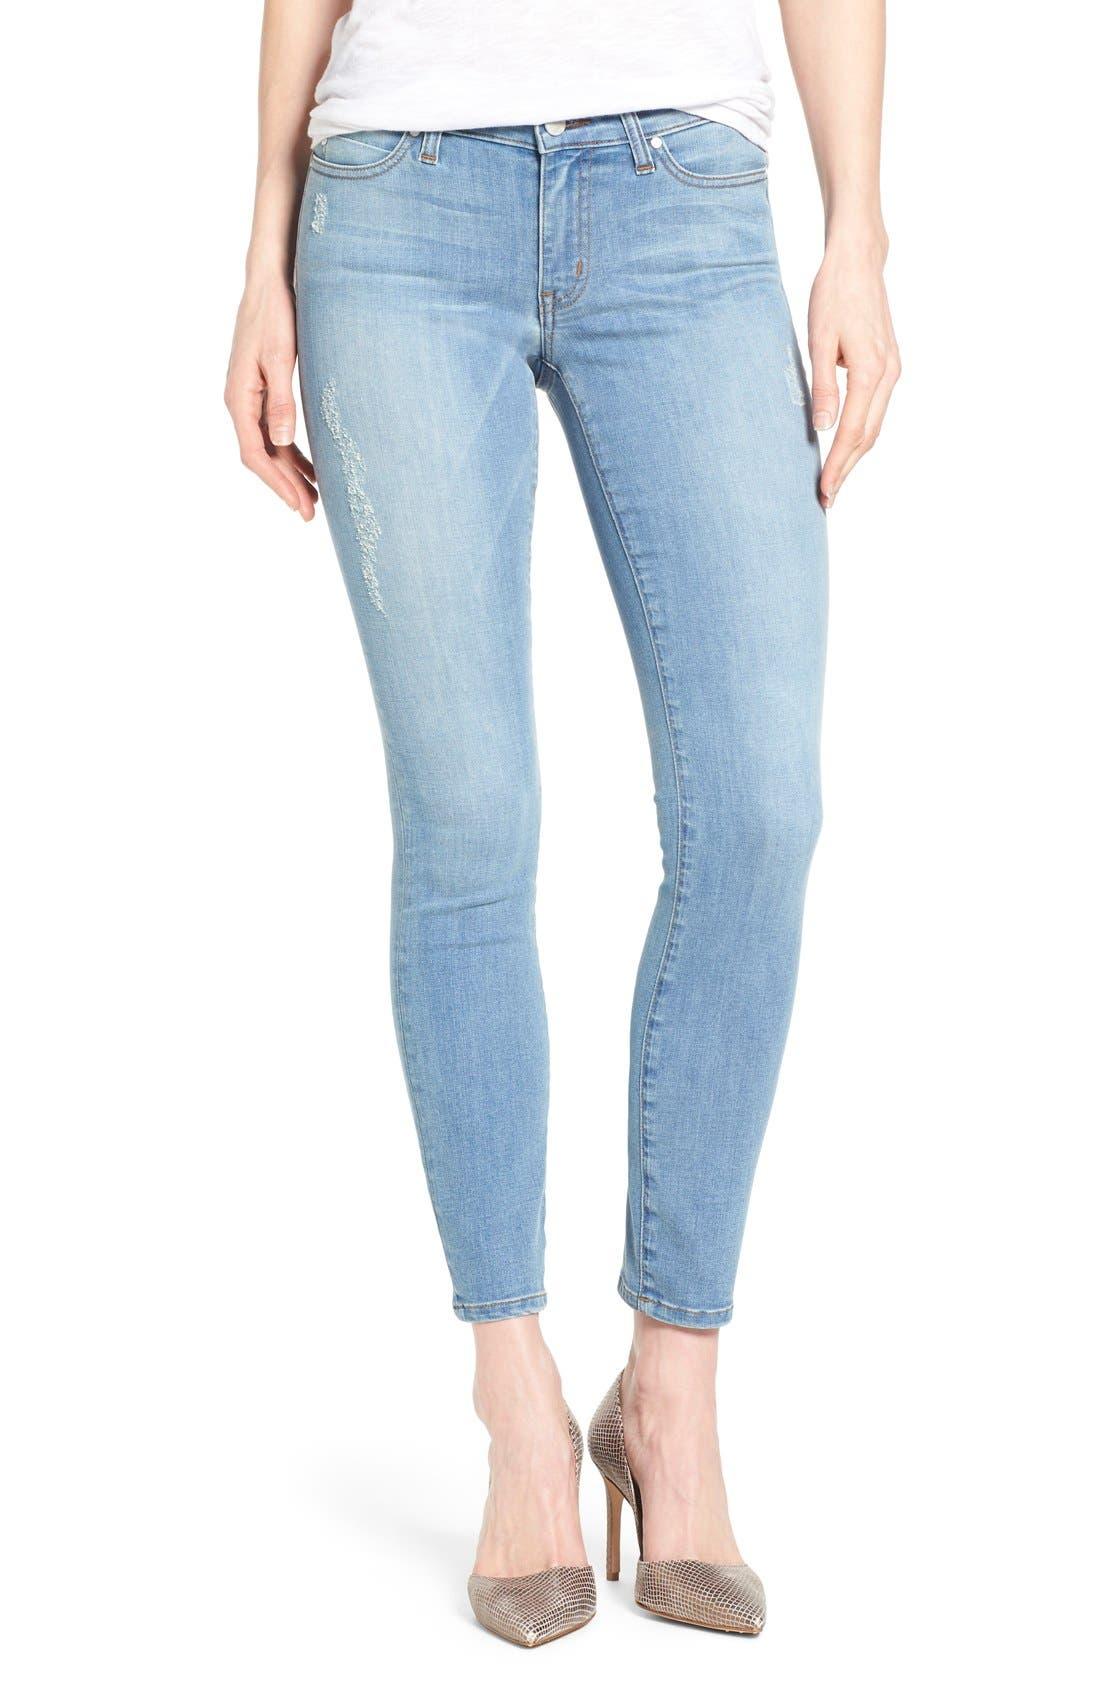 Alternate Image 1 Selected - Mavi Jeans 'Adriana' Distressed Stretch Skinny Ankle Jeans